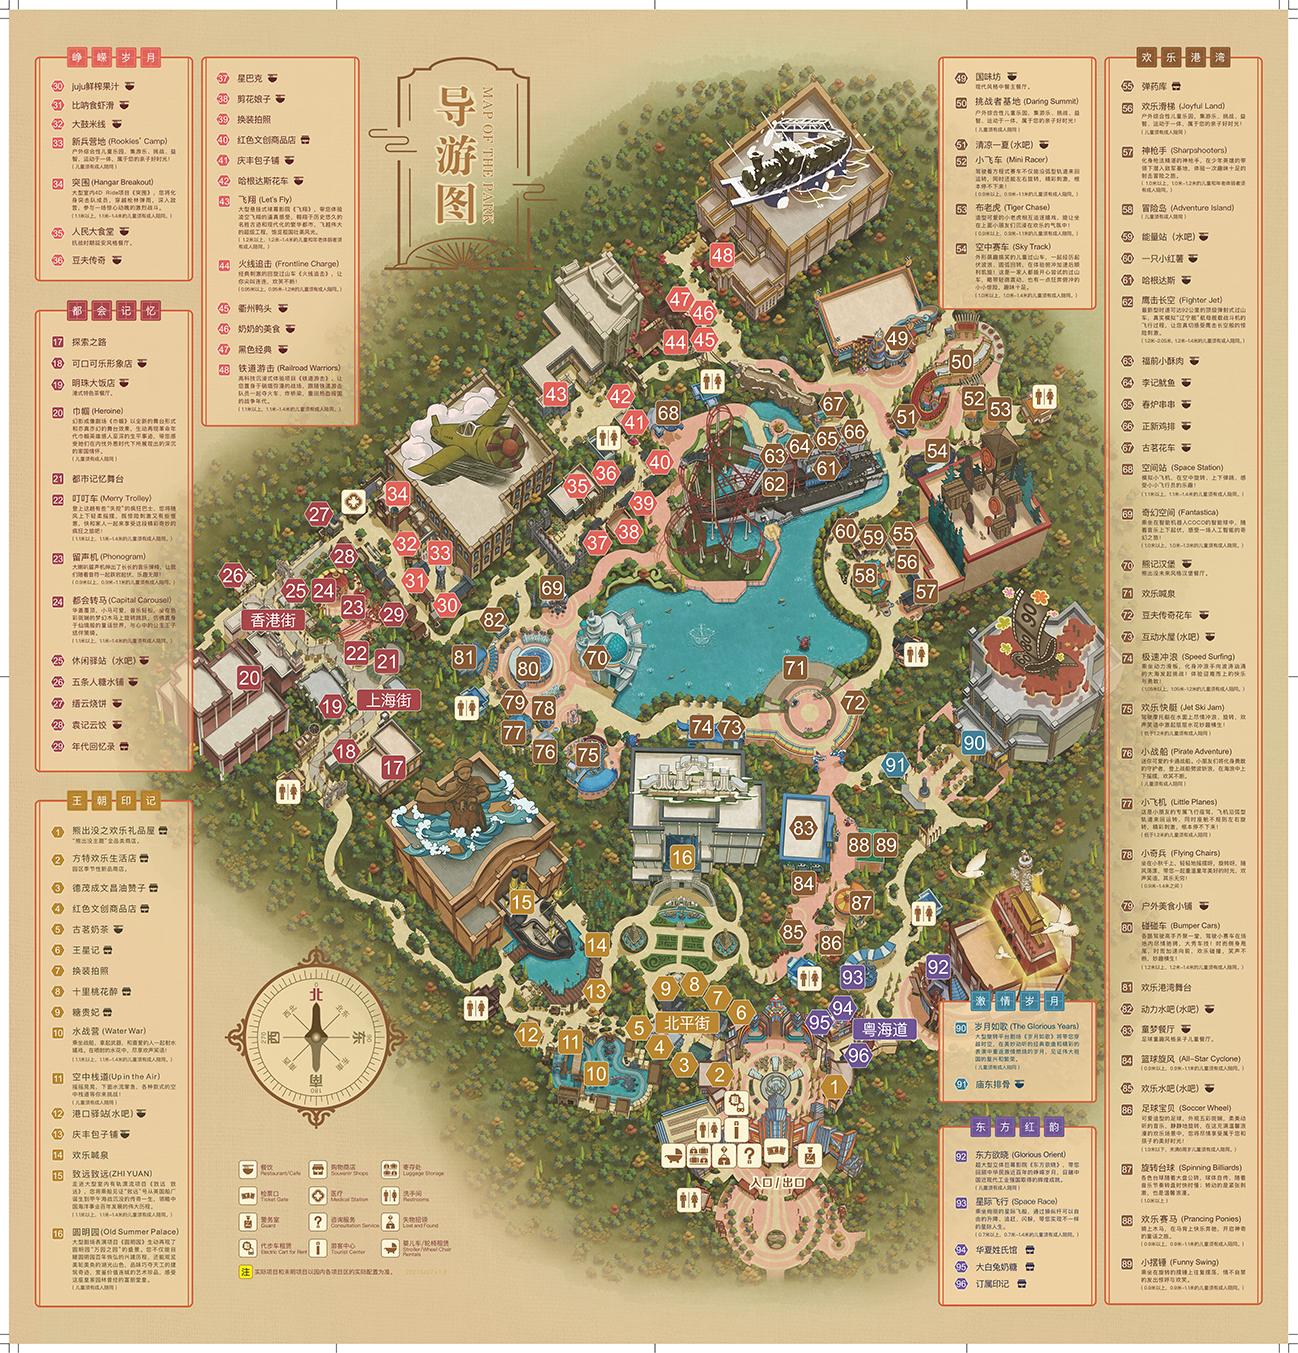 fantawild-theme-parks-42566700.jpg